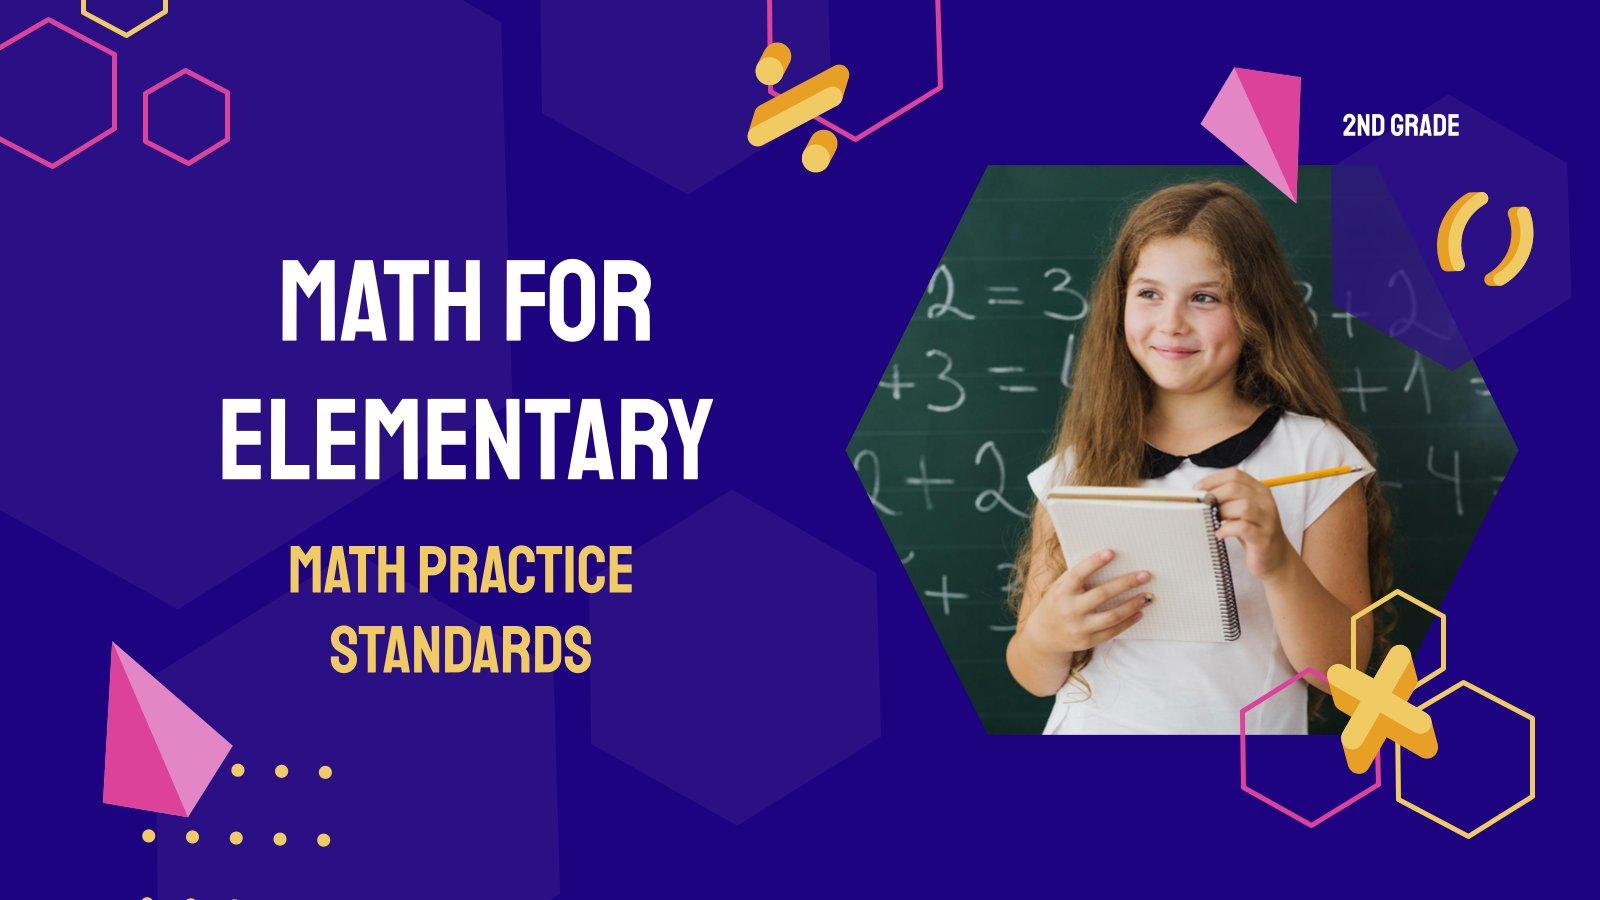 Math Practice Standards - Math for Elementary 2nd Grade presentation template